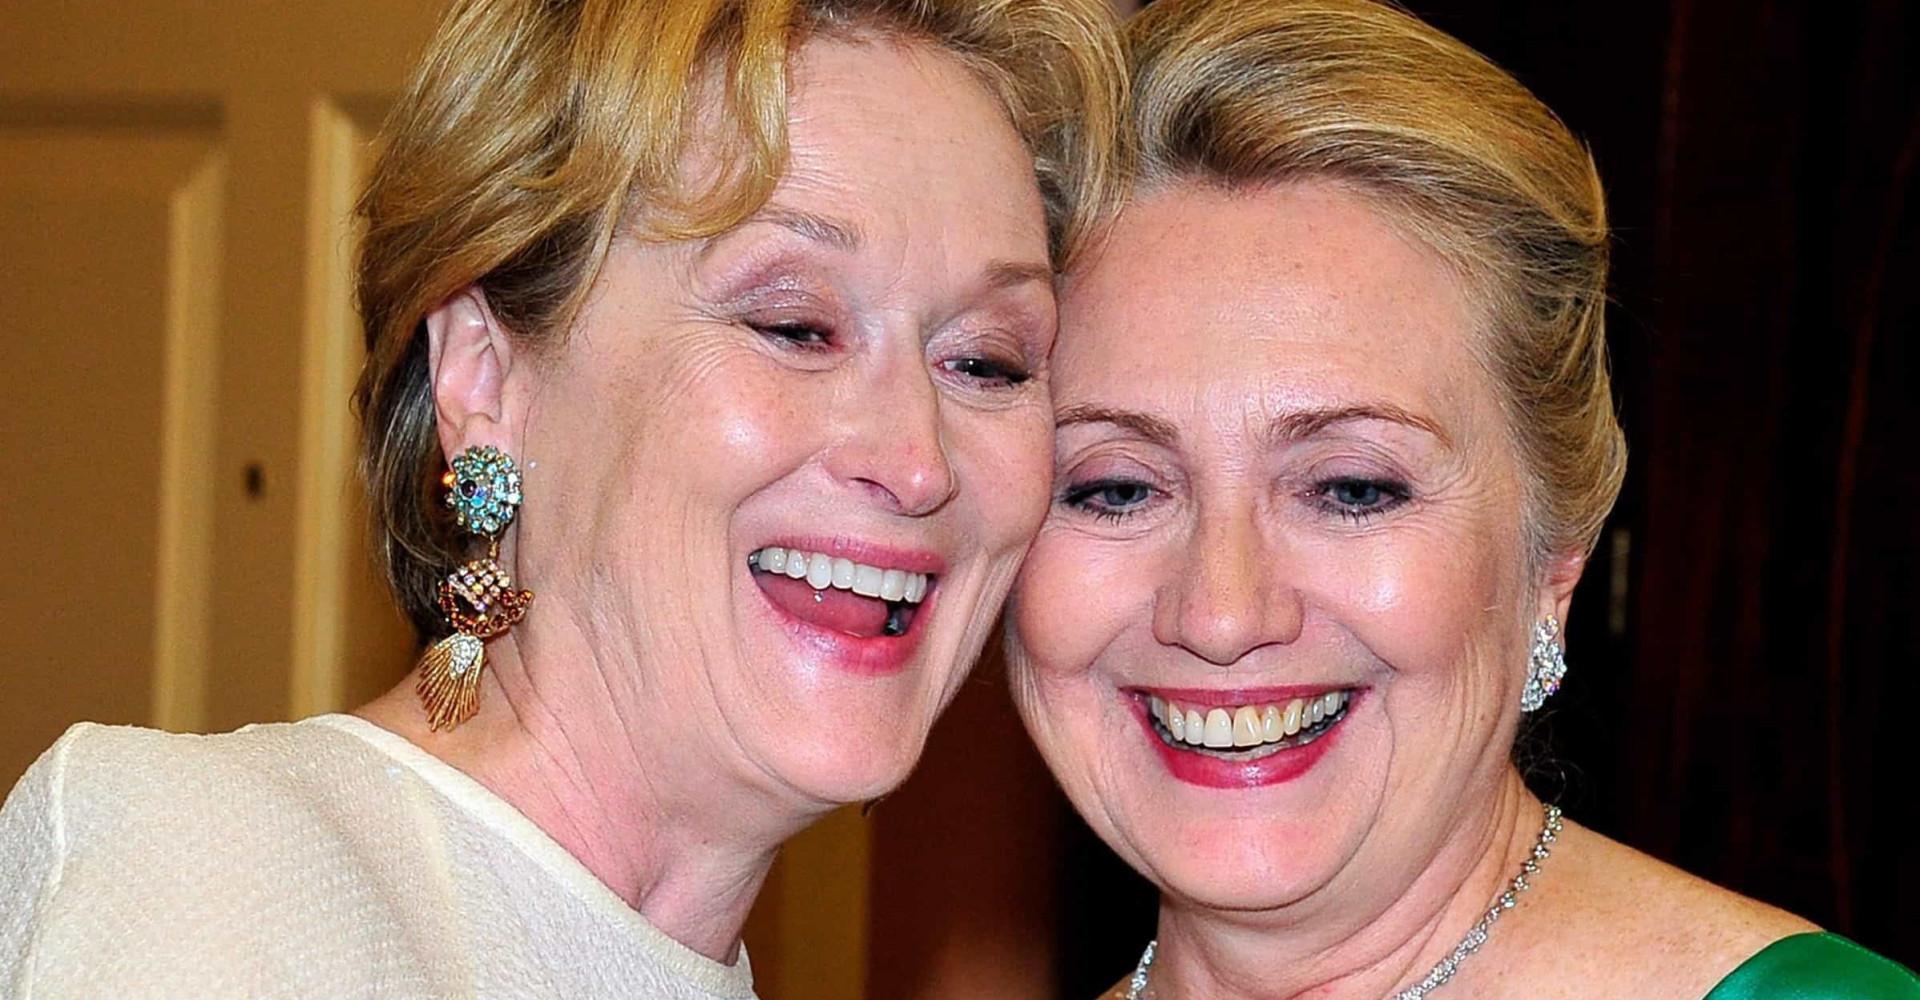 The politics of friendship: celeb and politician friends